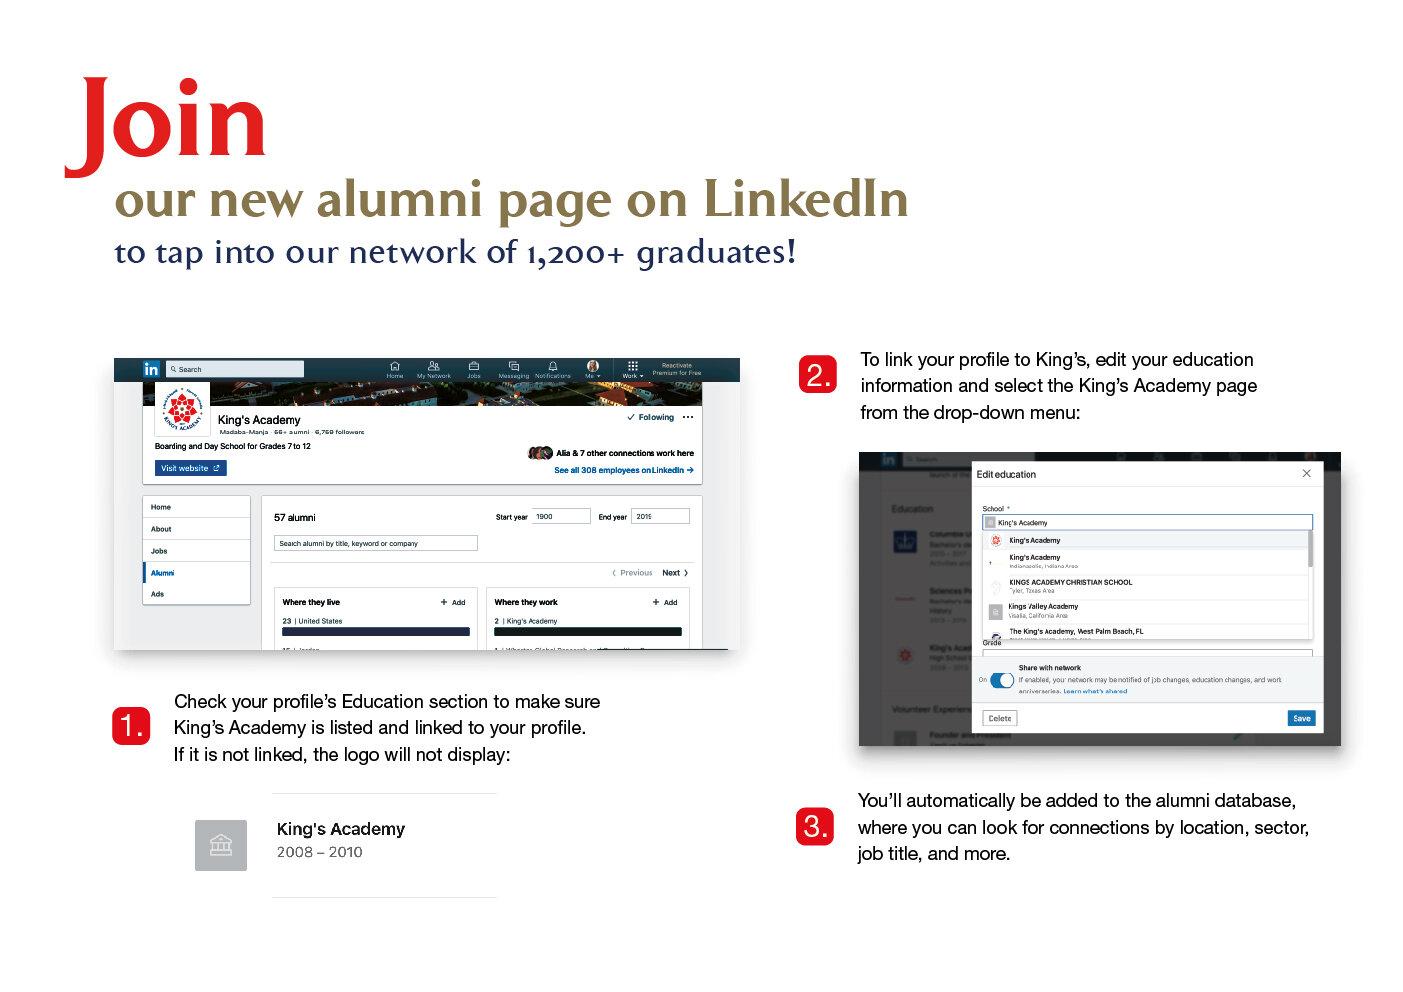 King's Academy Alumni Page on LinkedIn instructions